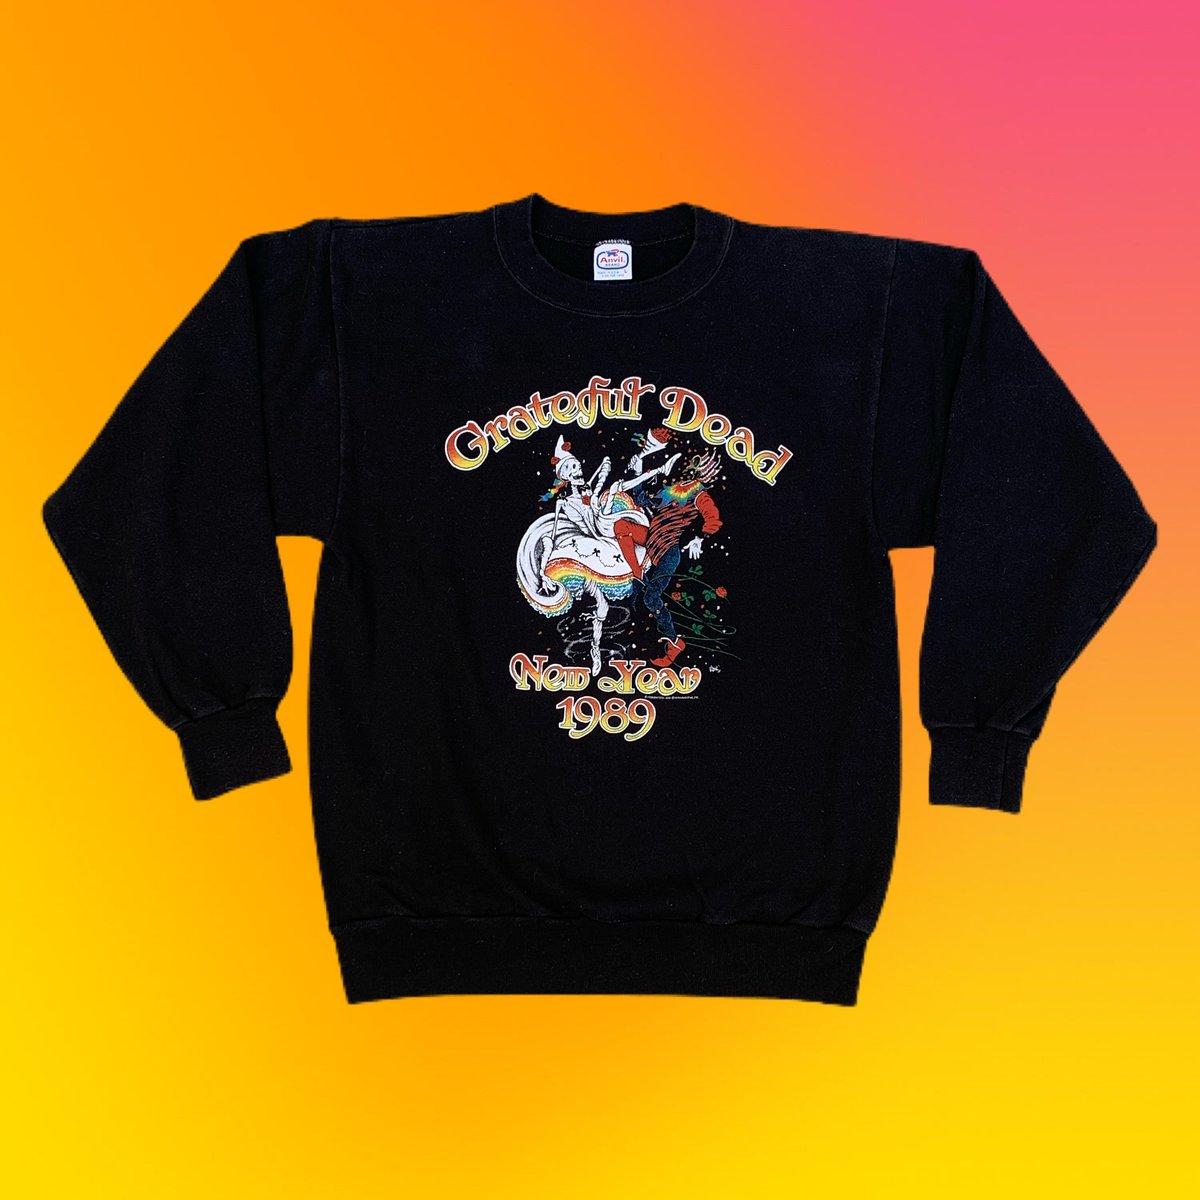 Original Vintage Grateful Dead 1989 NYE Long Sleeve Crewneck Sweatshirt! LARGE